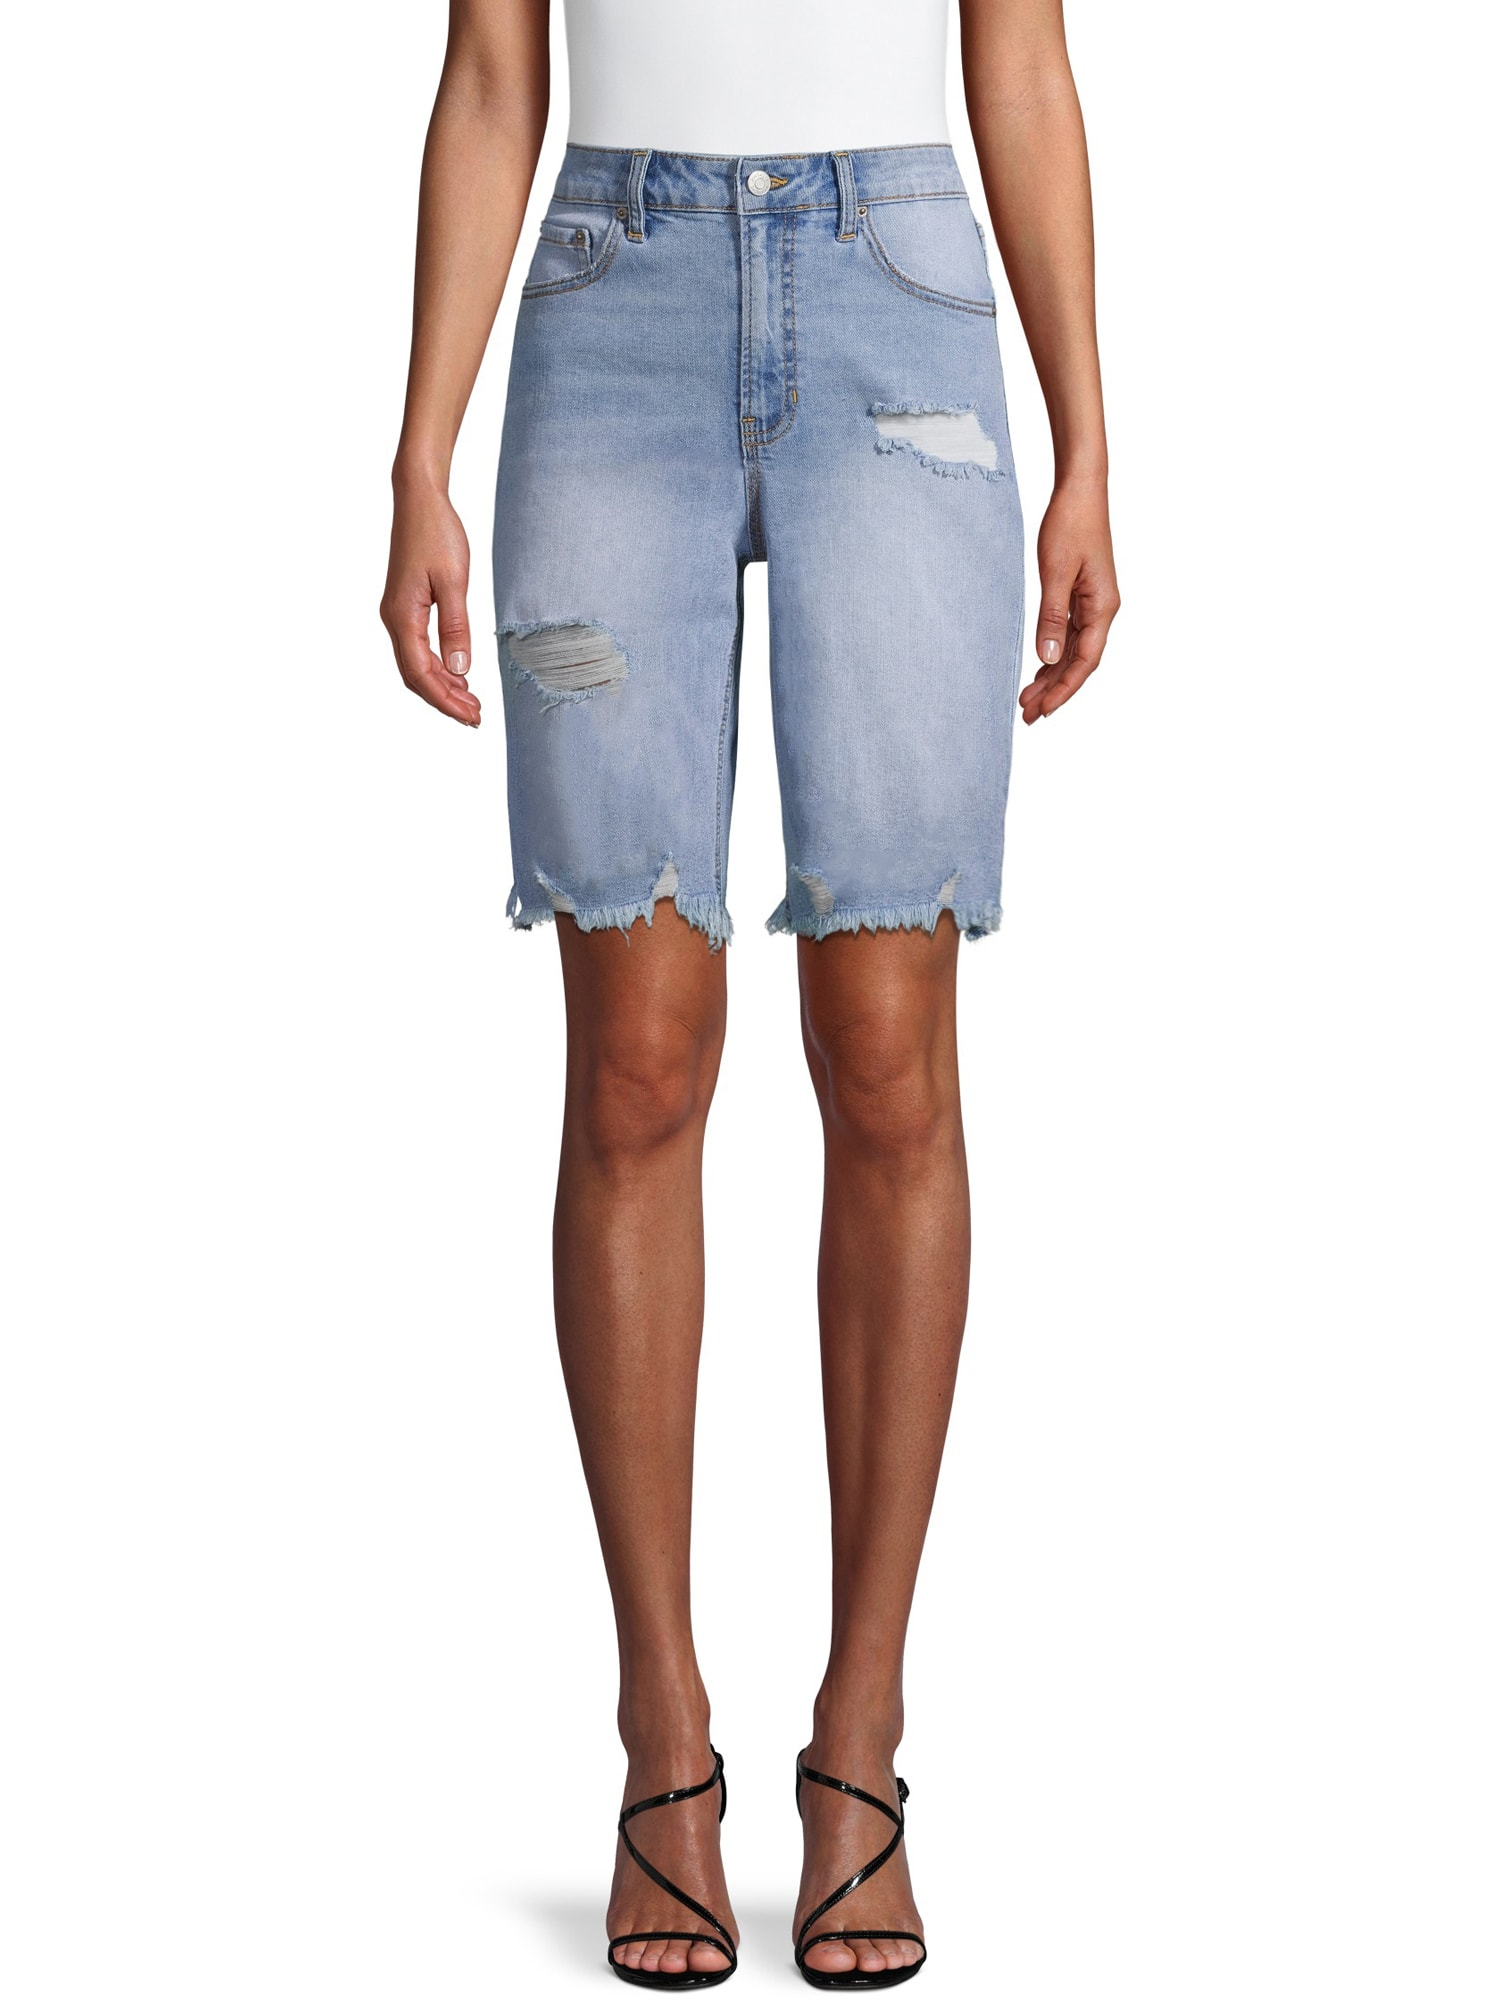 2-Count Mad Dog Boys' Fleece Sleep Pants w/ Slipper Socks $4.50 ($2.25 each), Women's Jordache Vintage Bermuda Shorts $8, More + FS on $35+